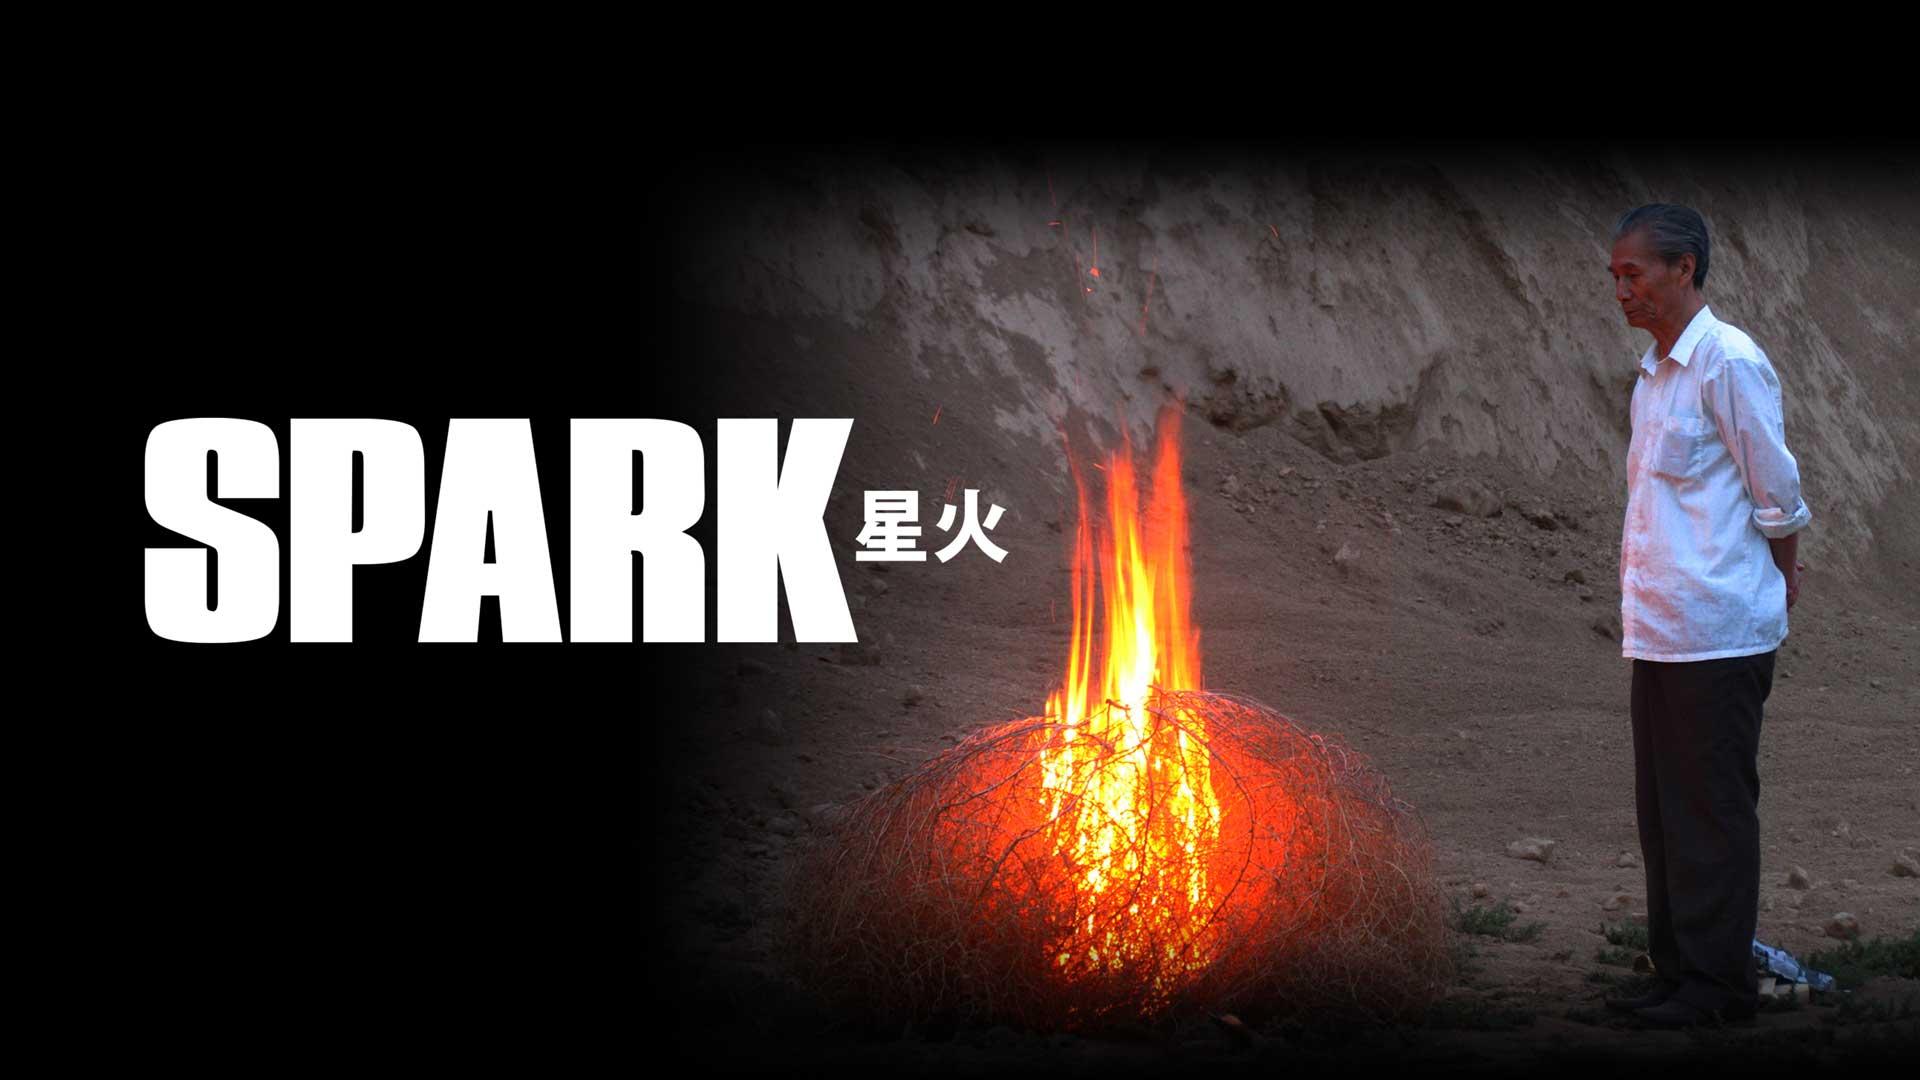 Spark - image